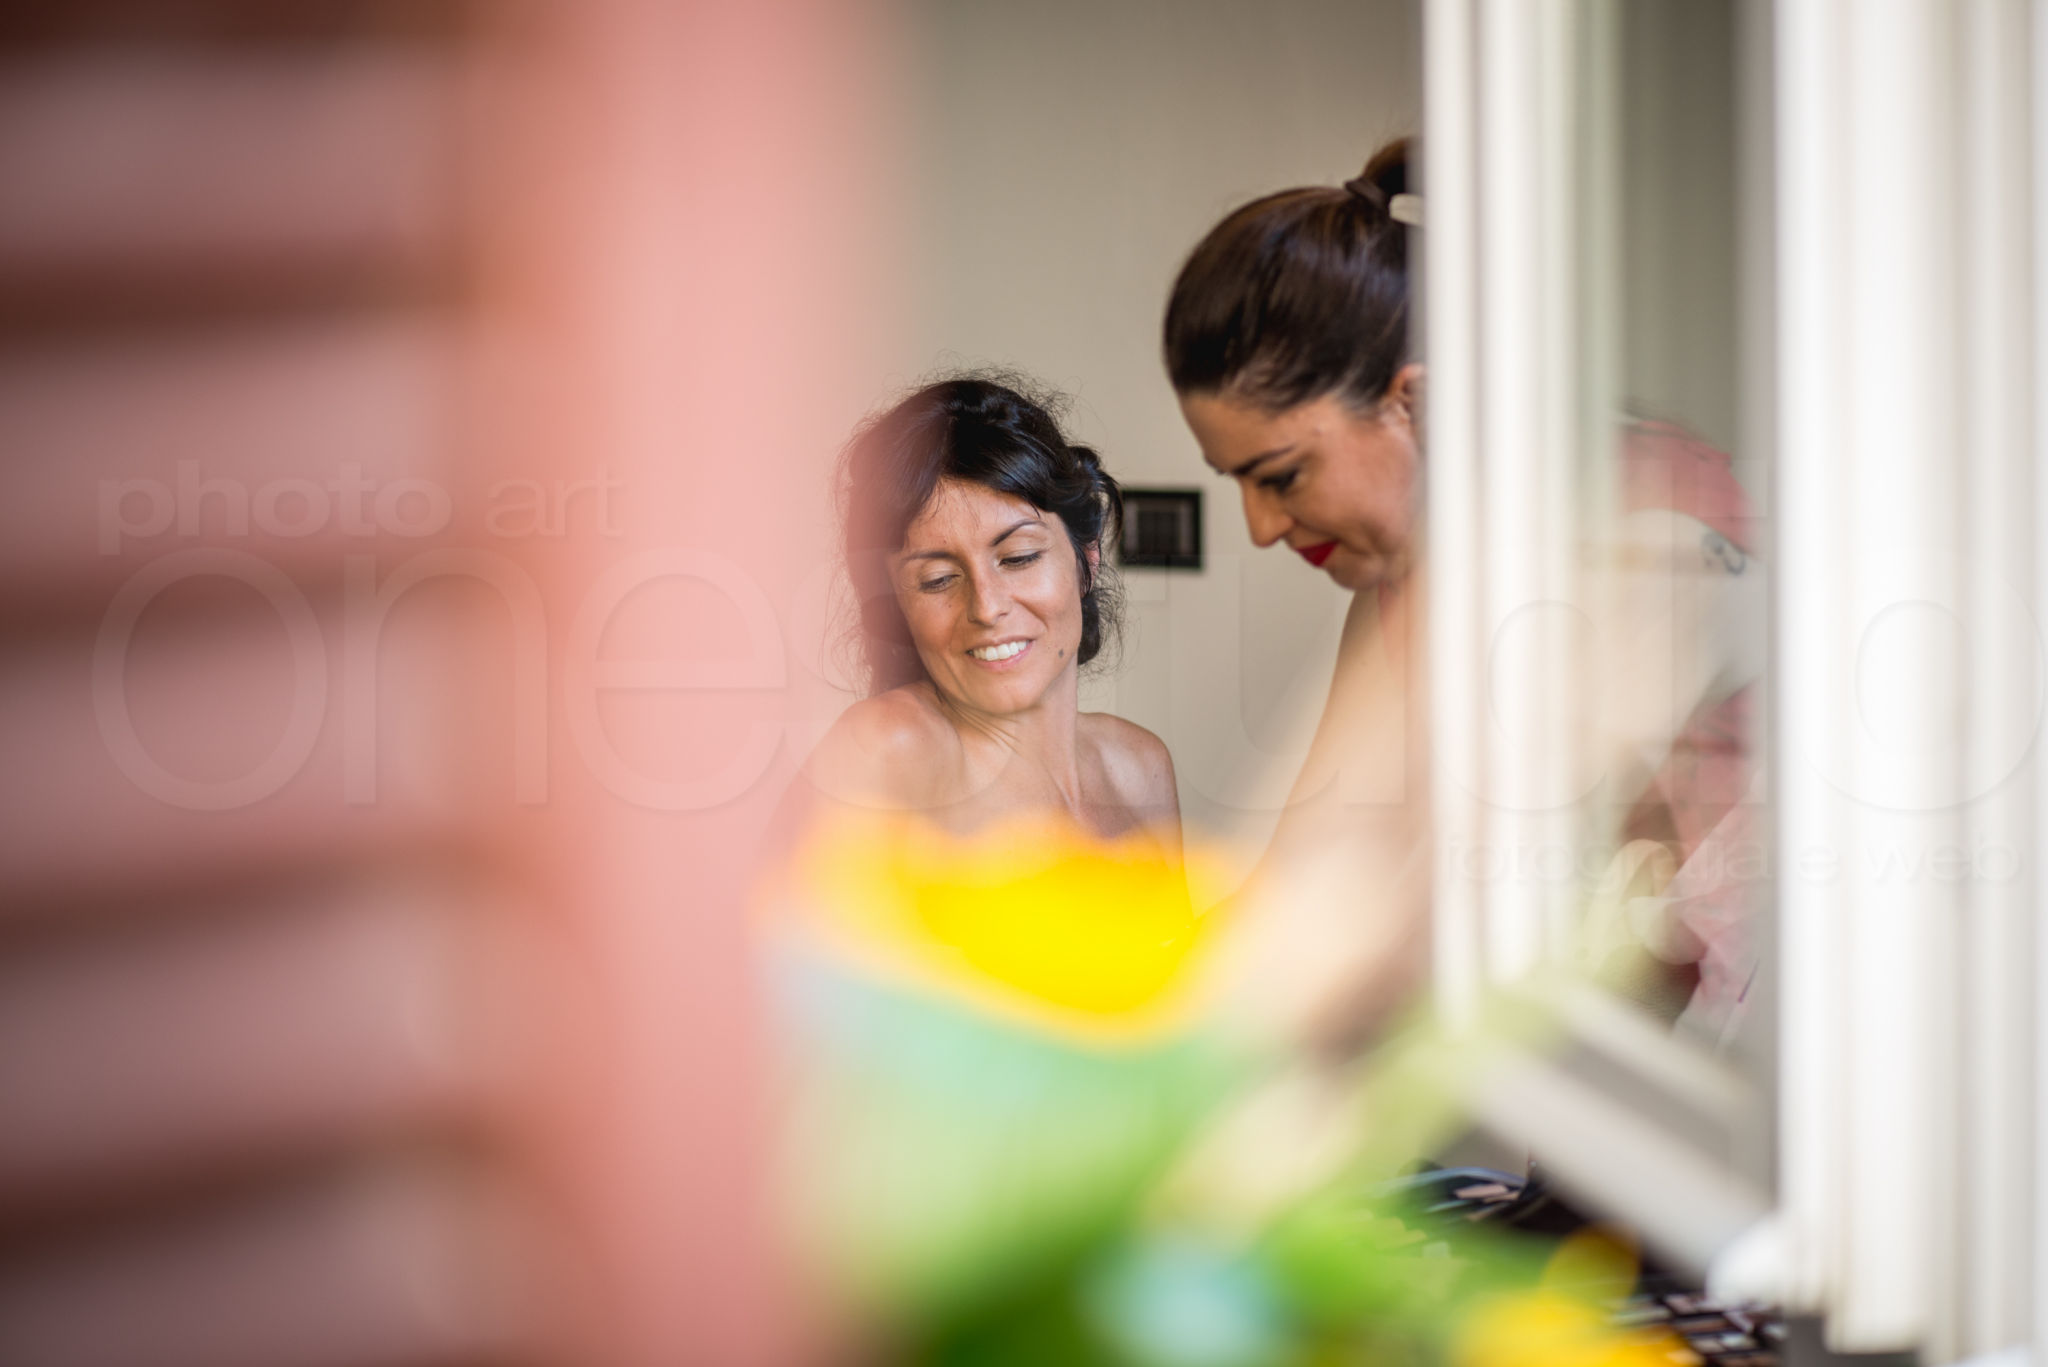 http://lnx.mirkone.it/wp-content/uploads/2015/07/fotografo-matrimoni-faenza-0011.jpg